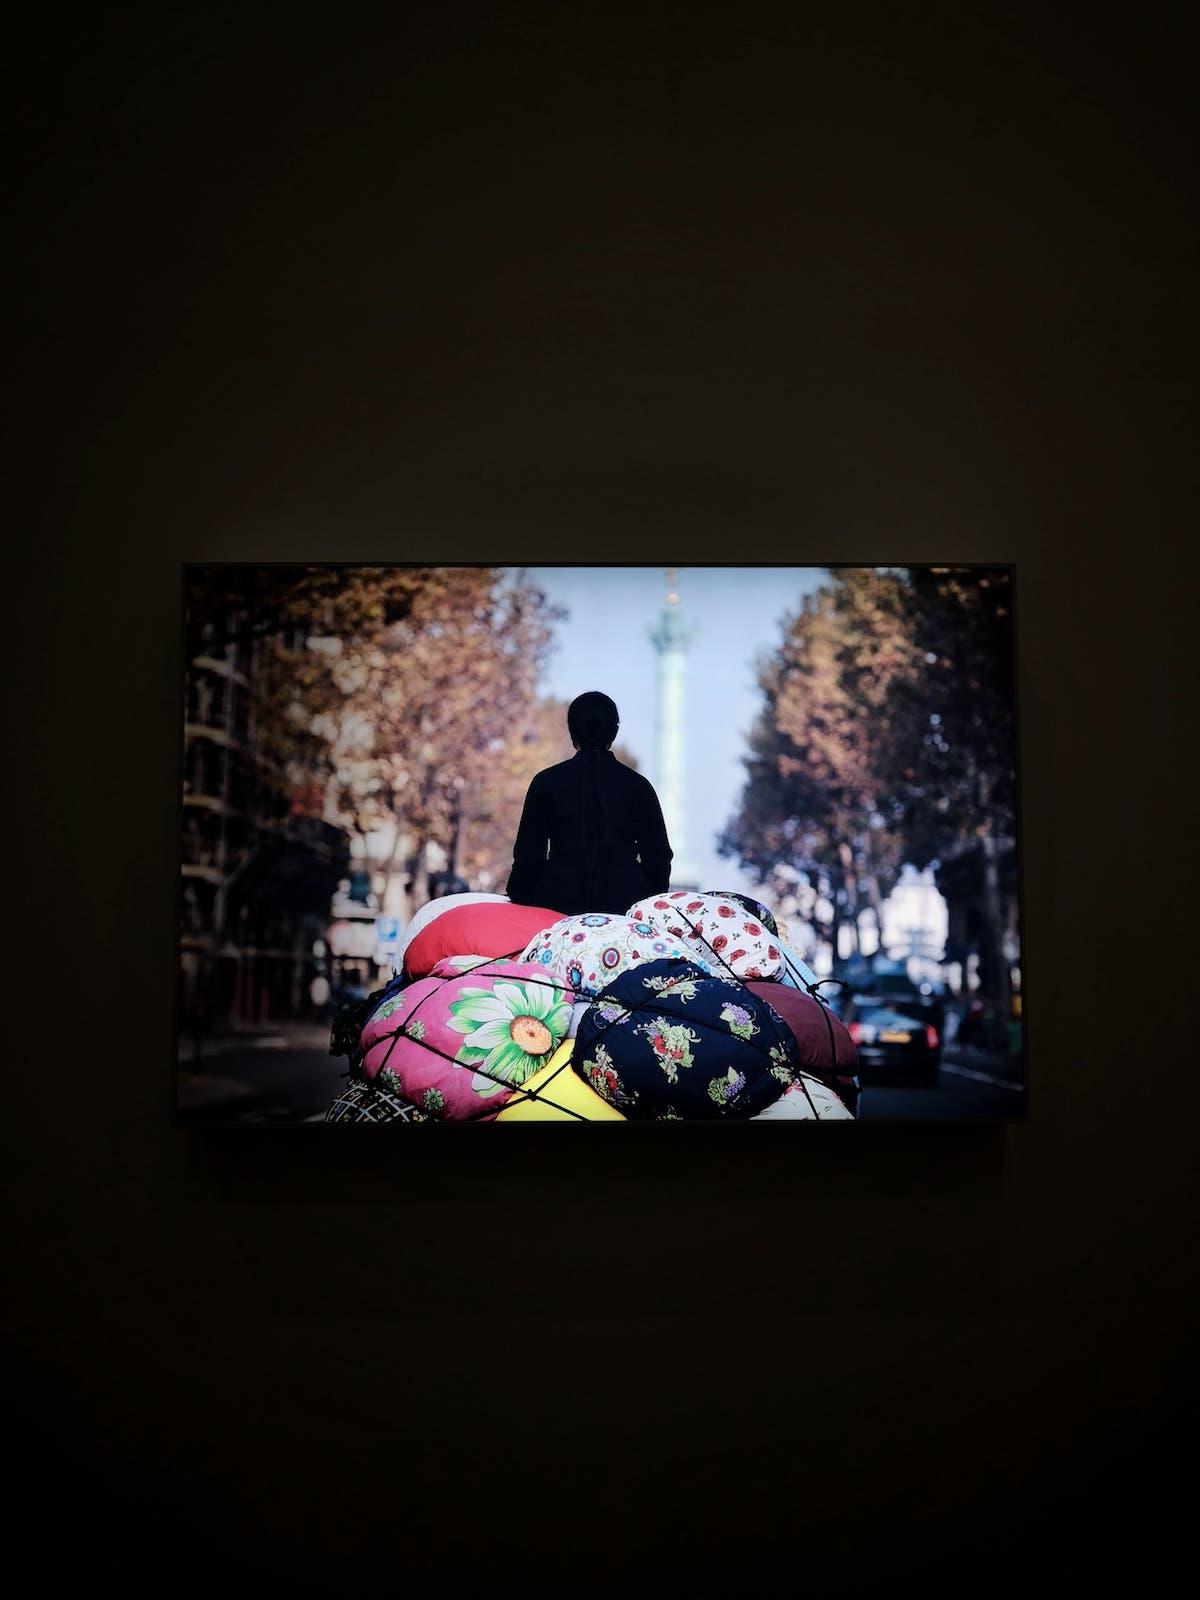 exposition-persona-grata-musee-immigration-mac-val-paris12e-vitry